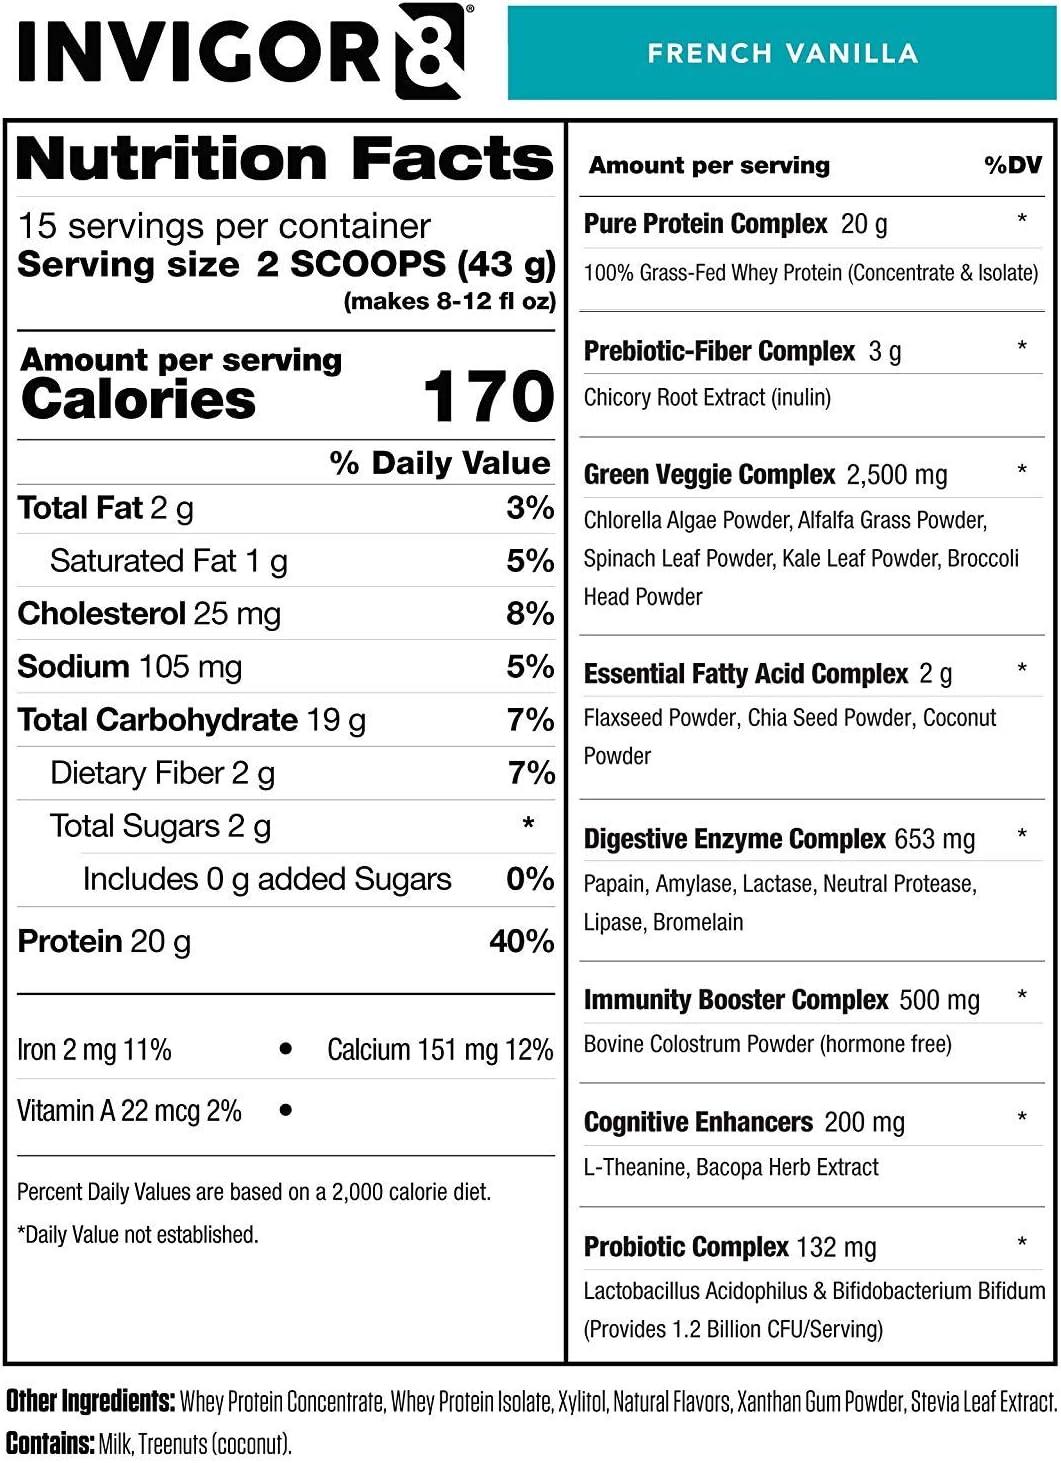 Amazon.com: INVIGOR8 Superfood Shake (4 unidades de vainilla ...